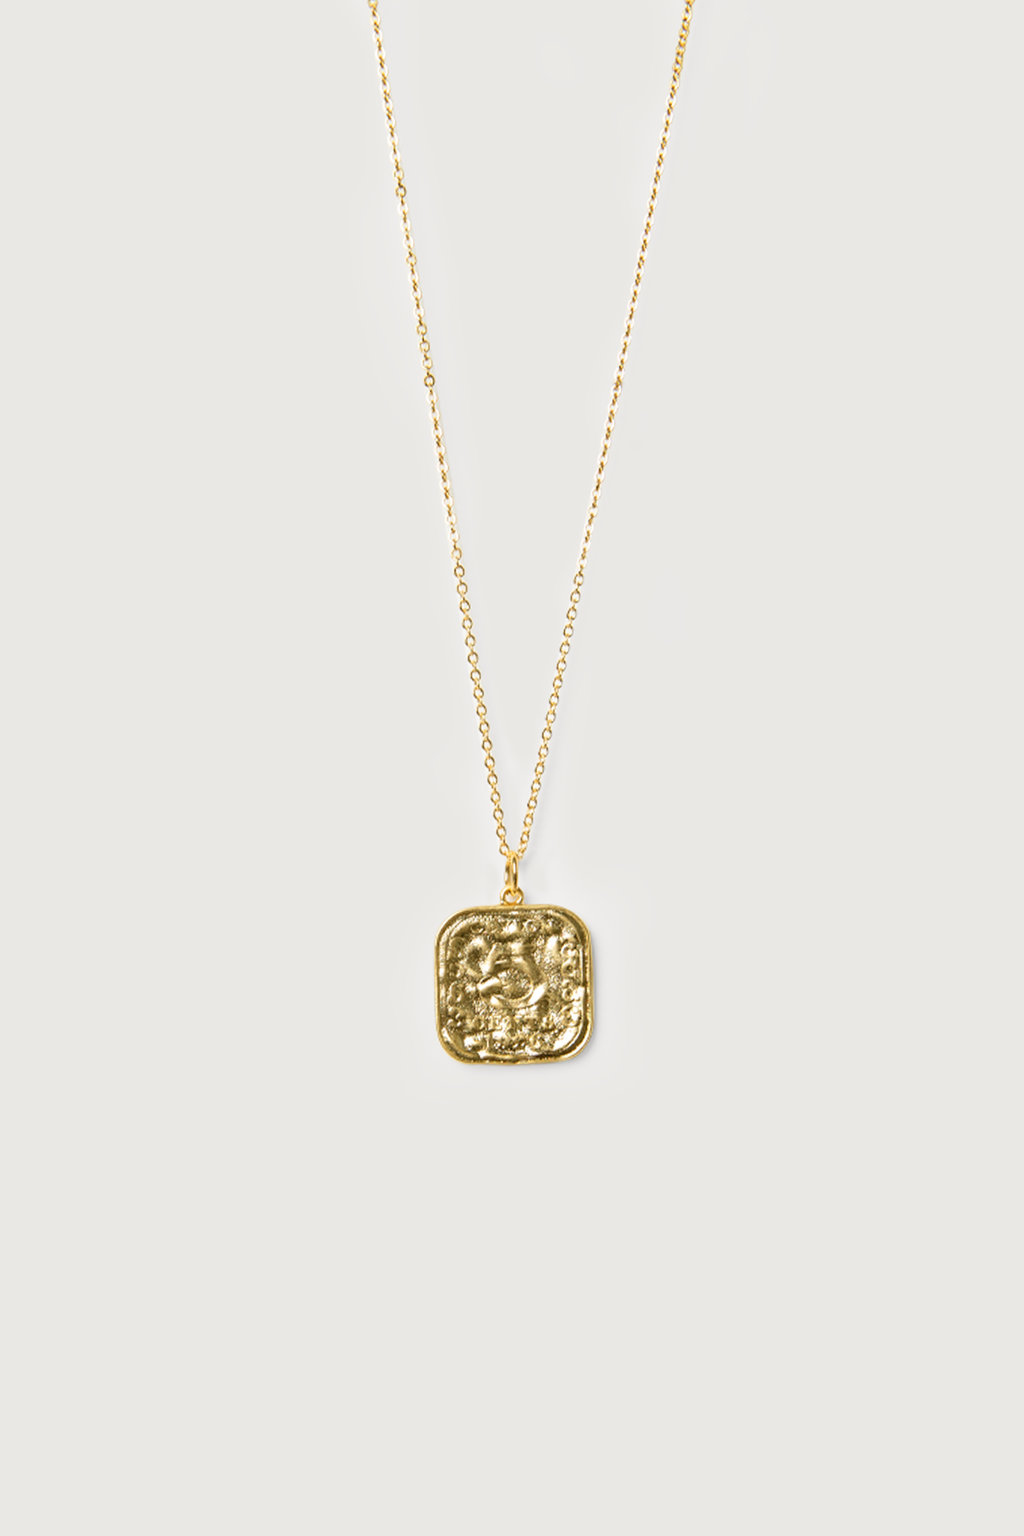 Necklace K010 Gold 2